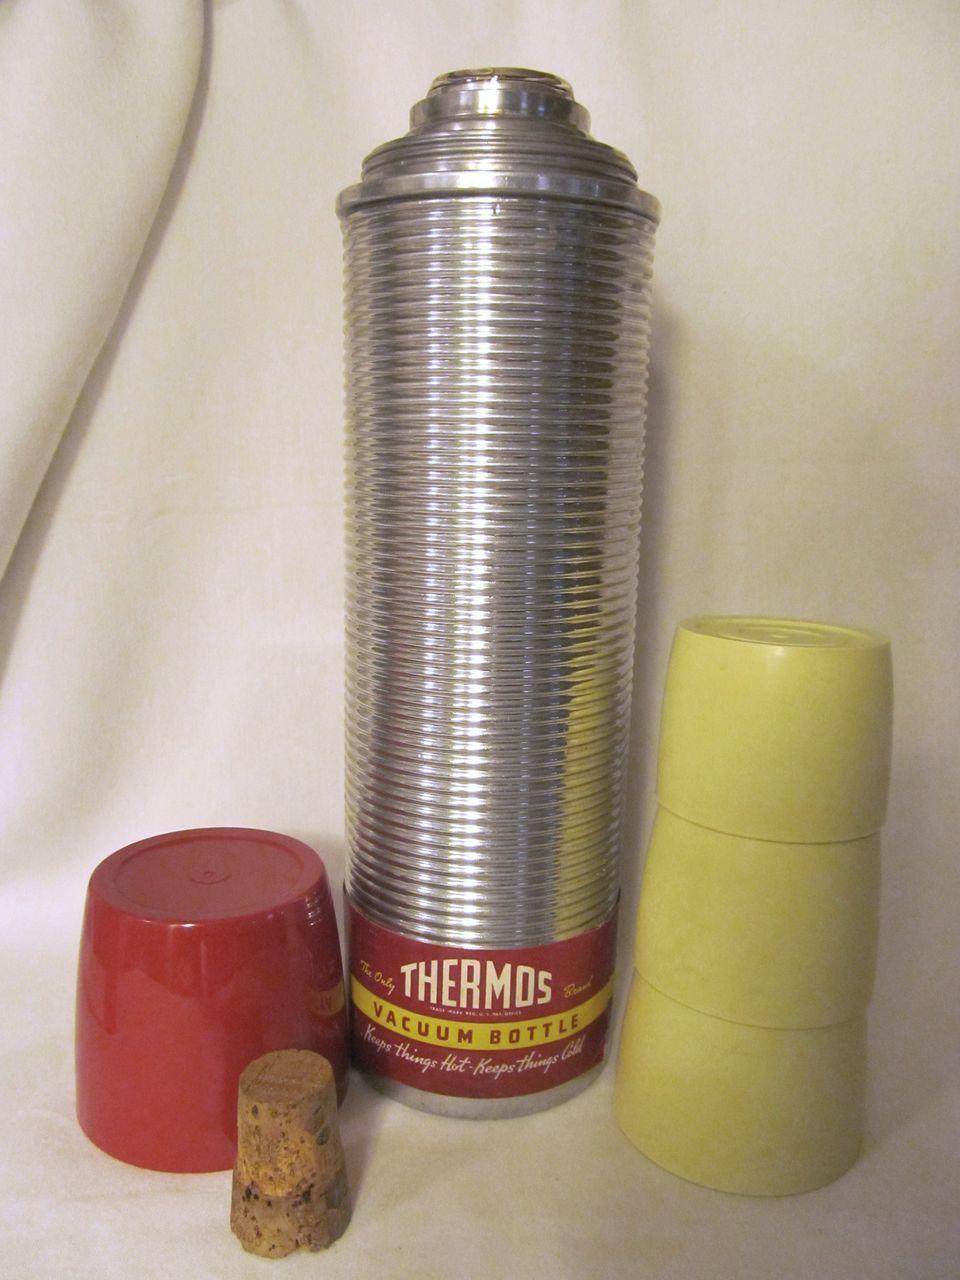 Thermos,Cork,3 Cups, Original Label